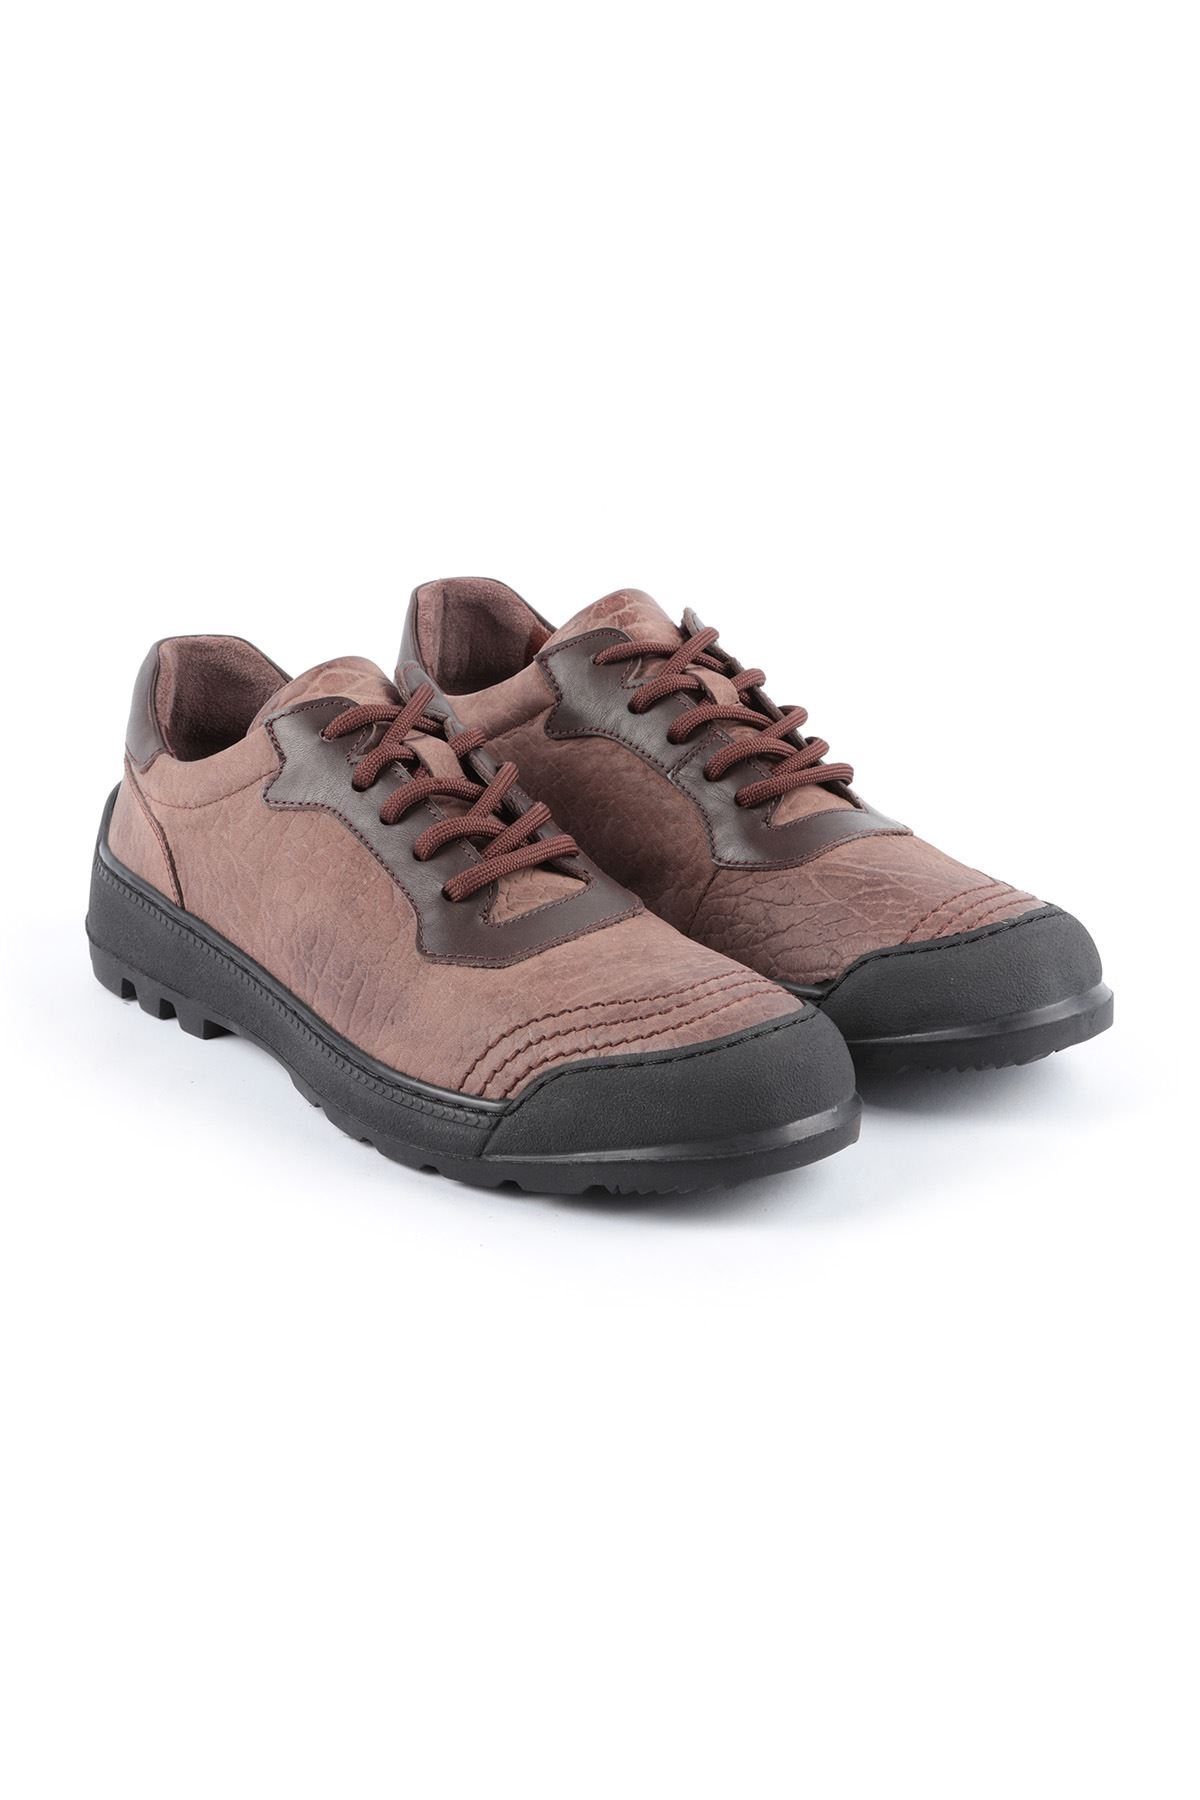 Libero L3178 EA Vizon Erkek Ayakkabı